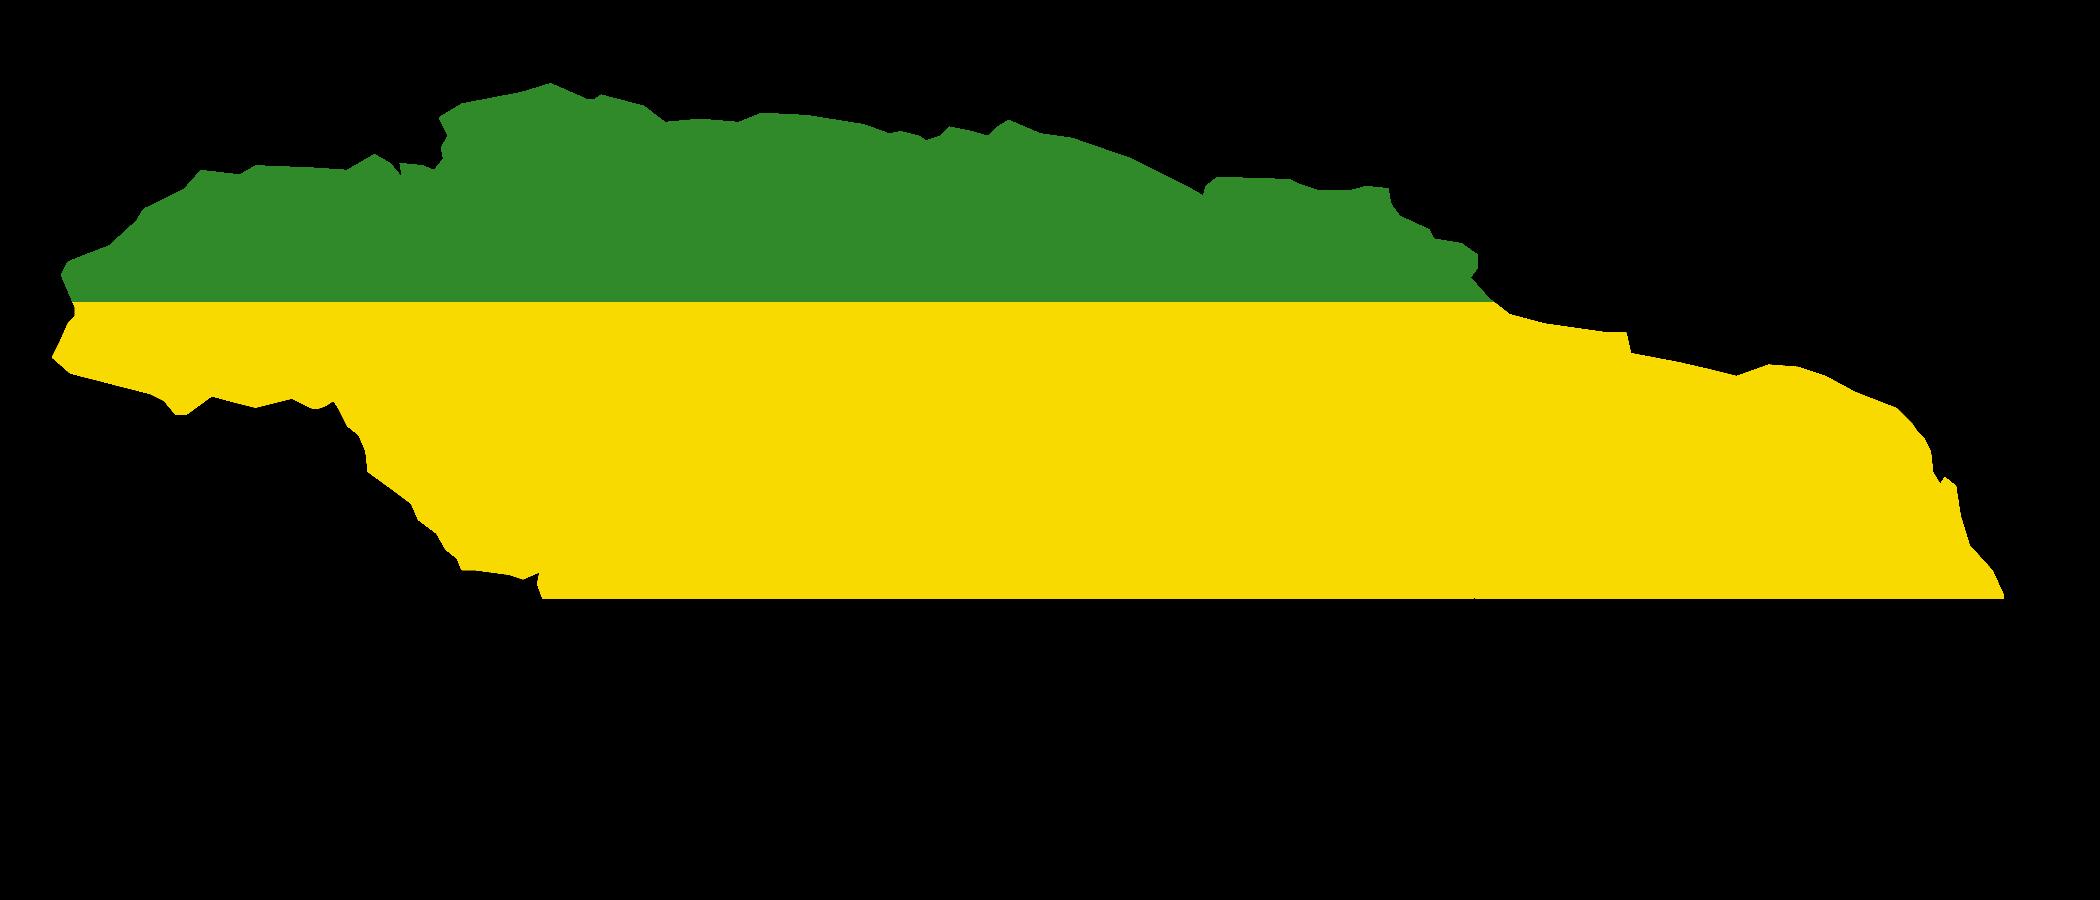 2100x900 Jamaica Map Vector